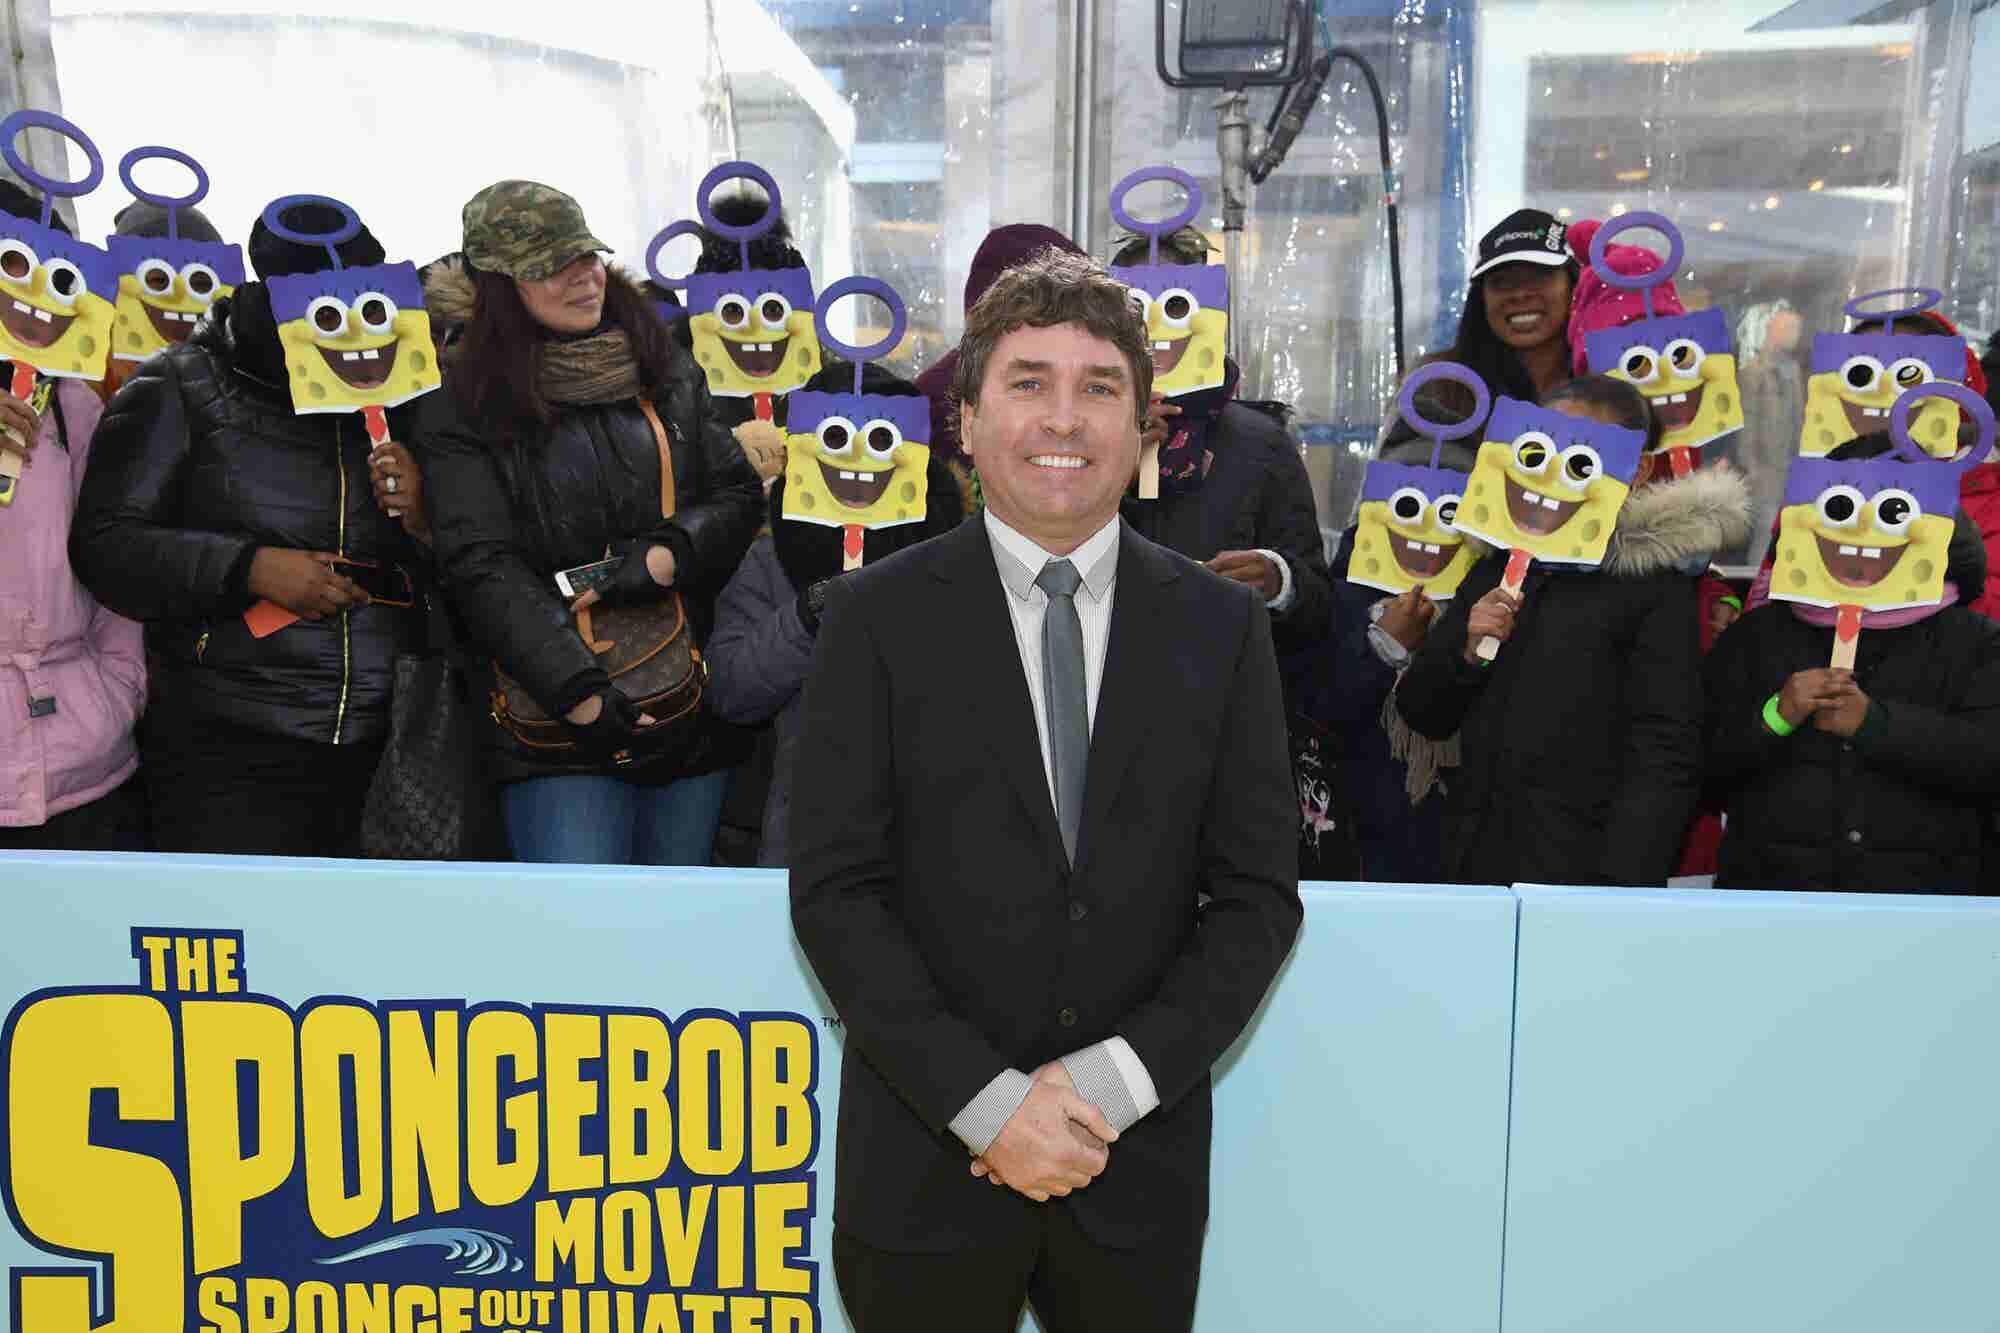 'Spongebob Squarepants' Creator Stephen Hillenburg Dead at 57